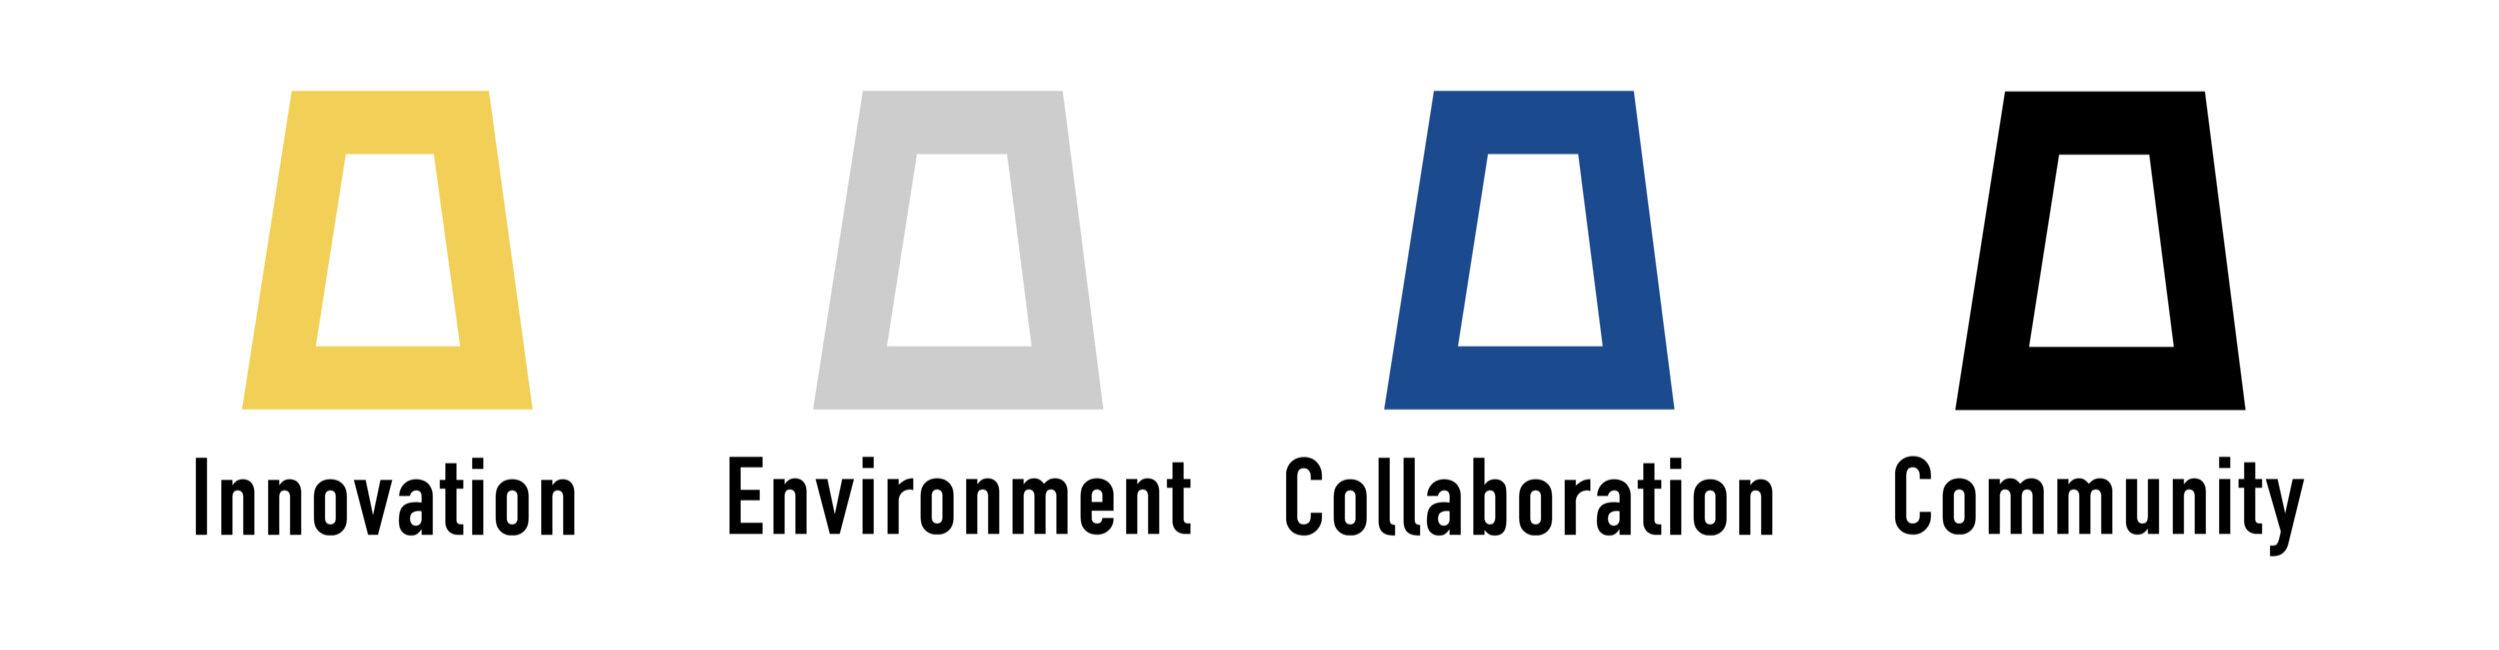 NoBackground-Pillars.jpg